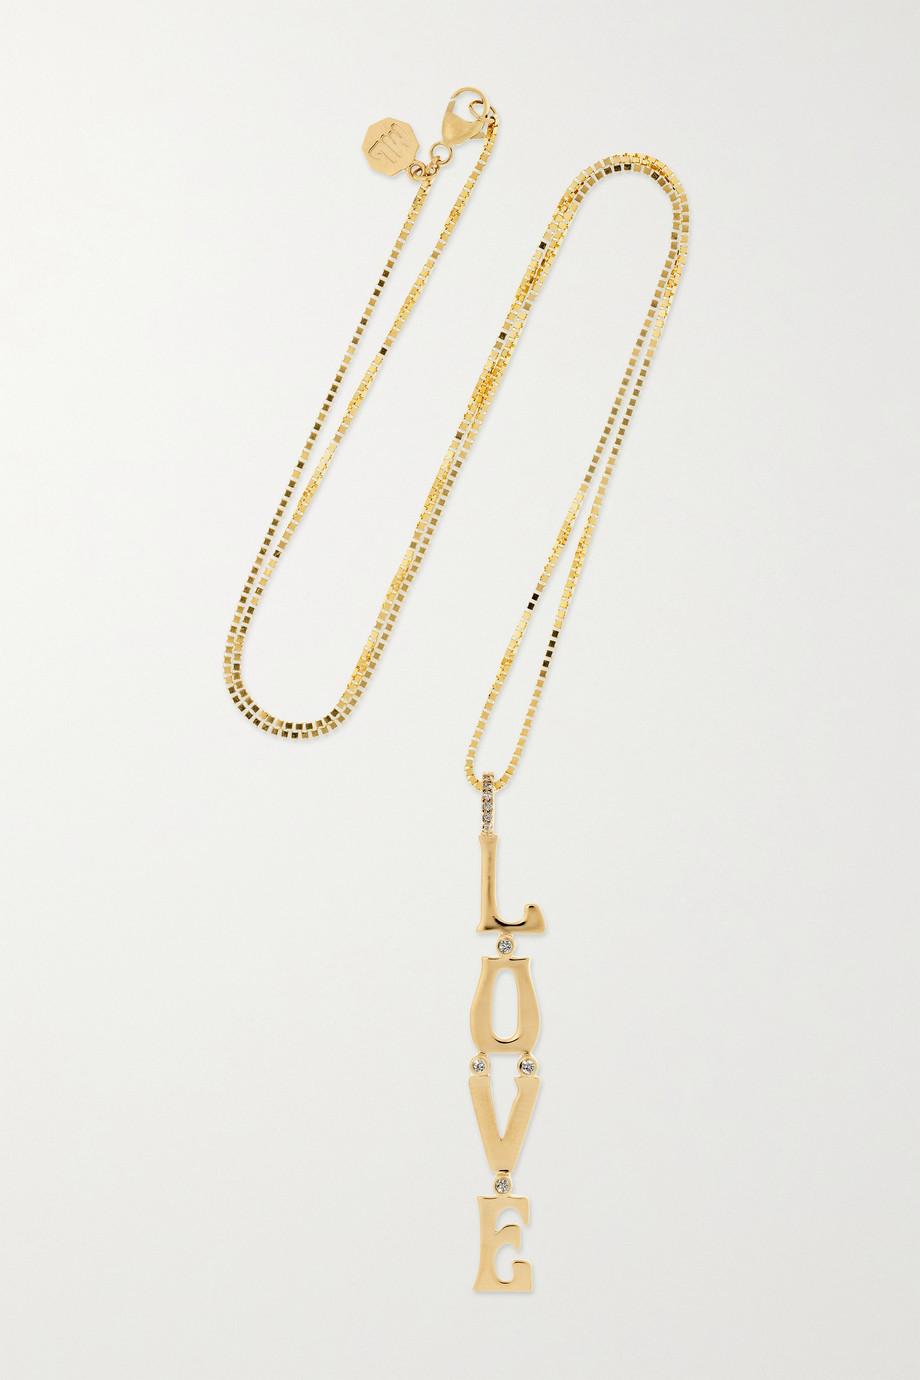 Marlo Laz Love 14-karat gold diamond necklace